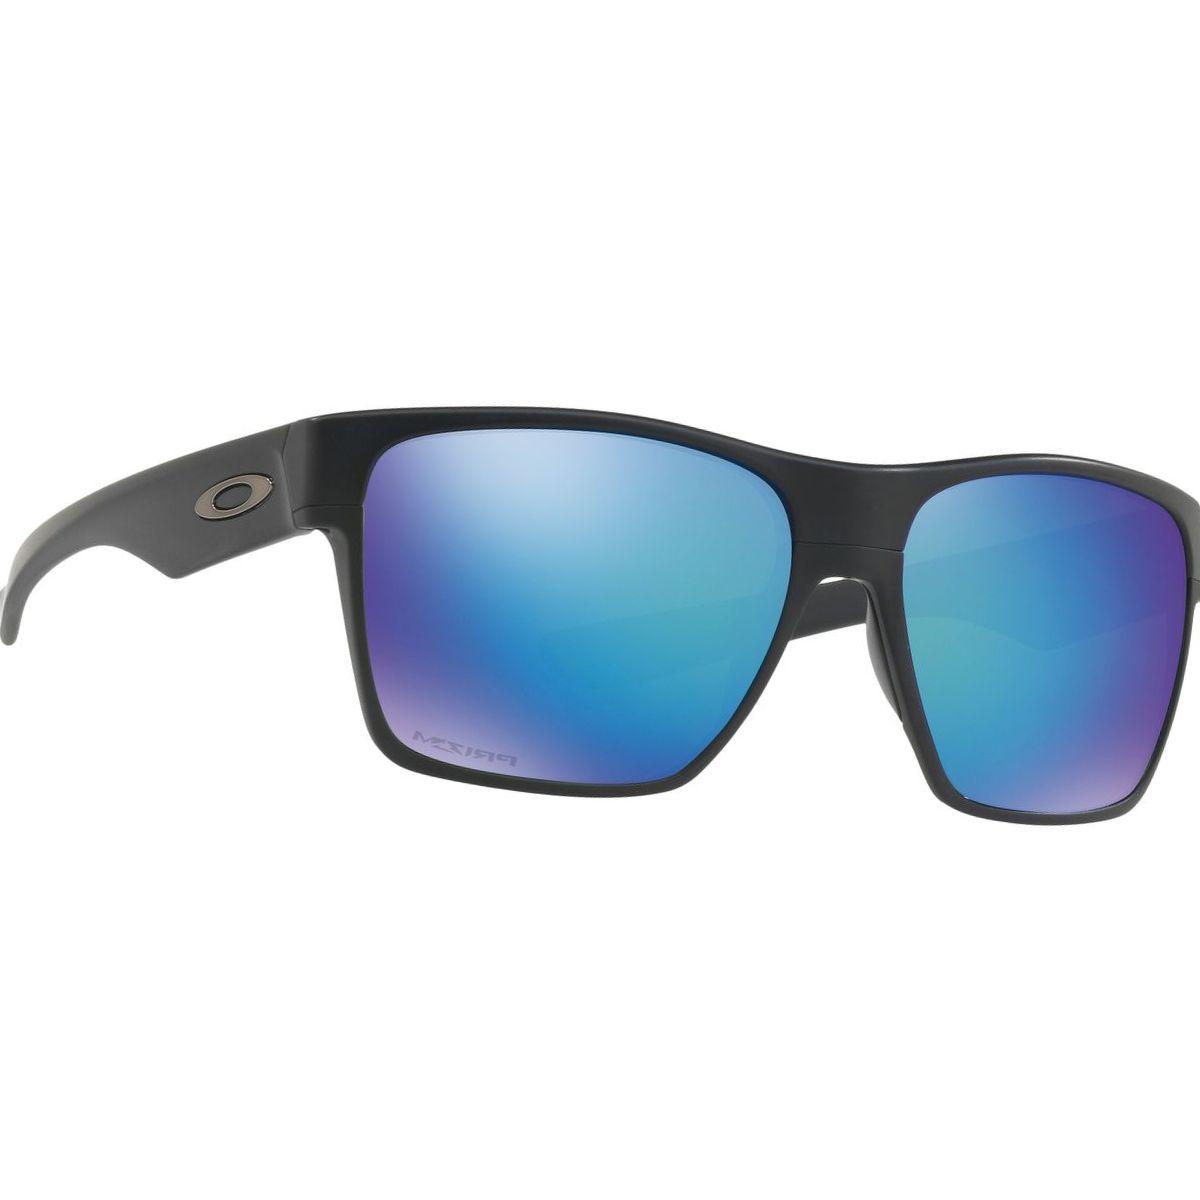 Oakley Twoface XL Prizm Polarized Sunglasses - Men's